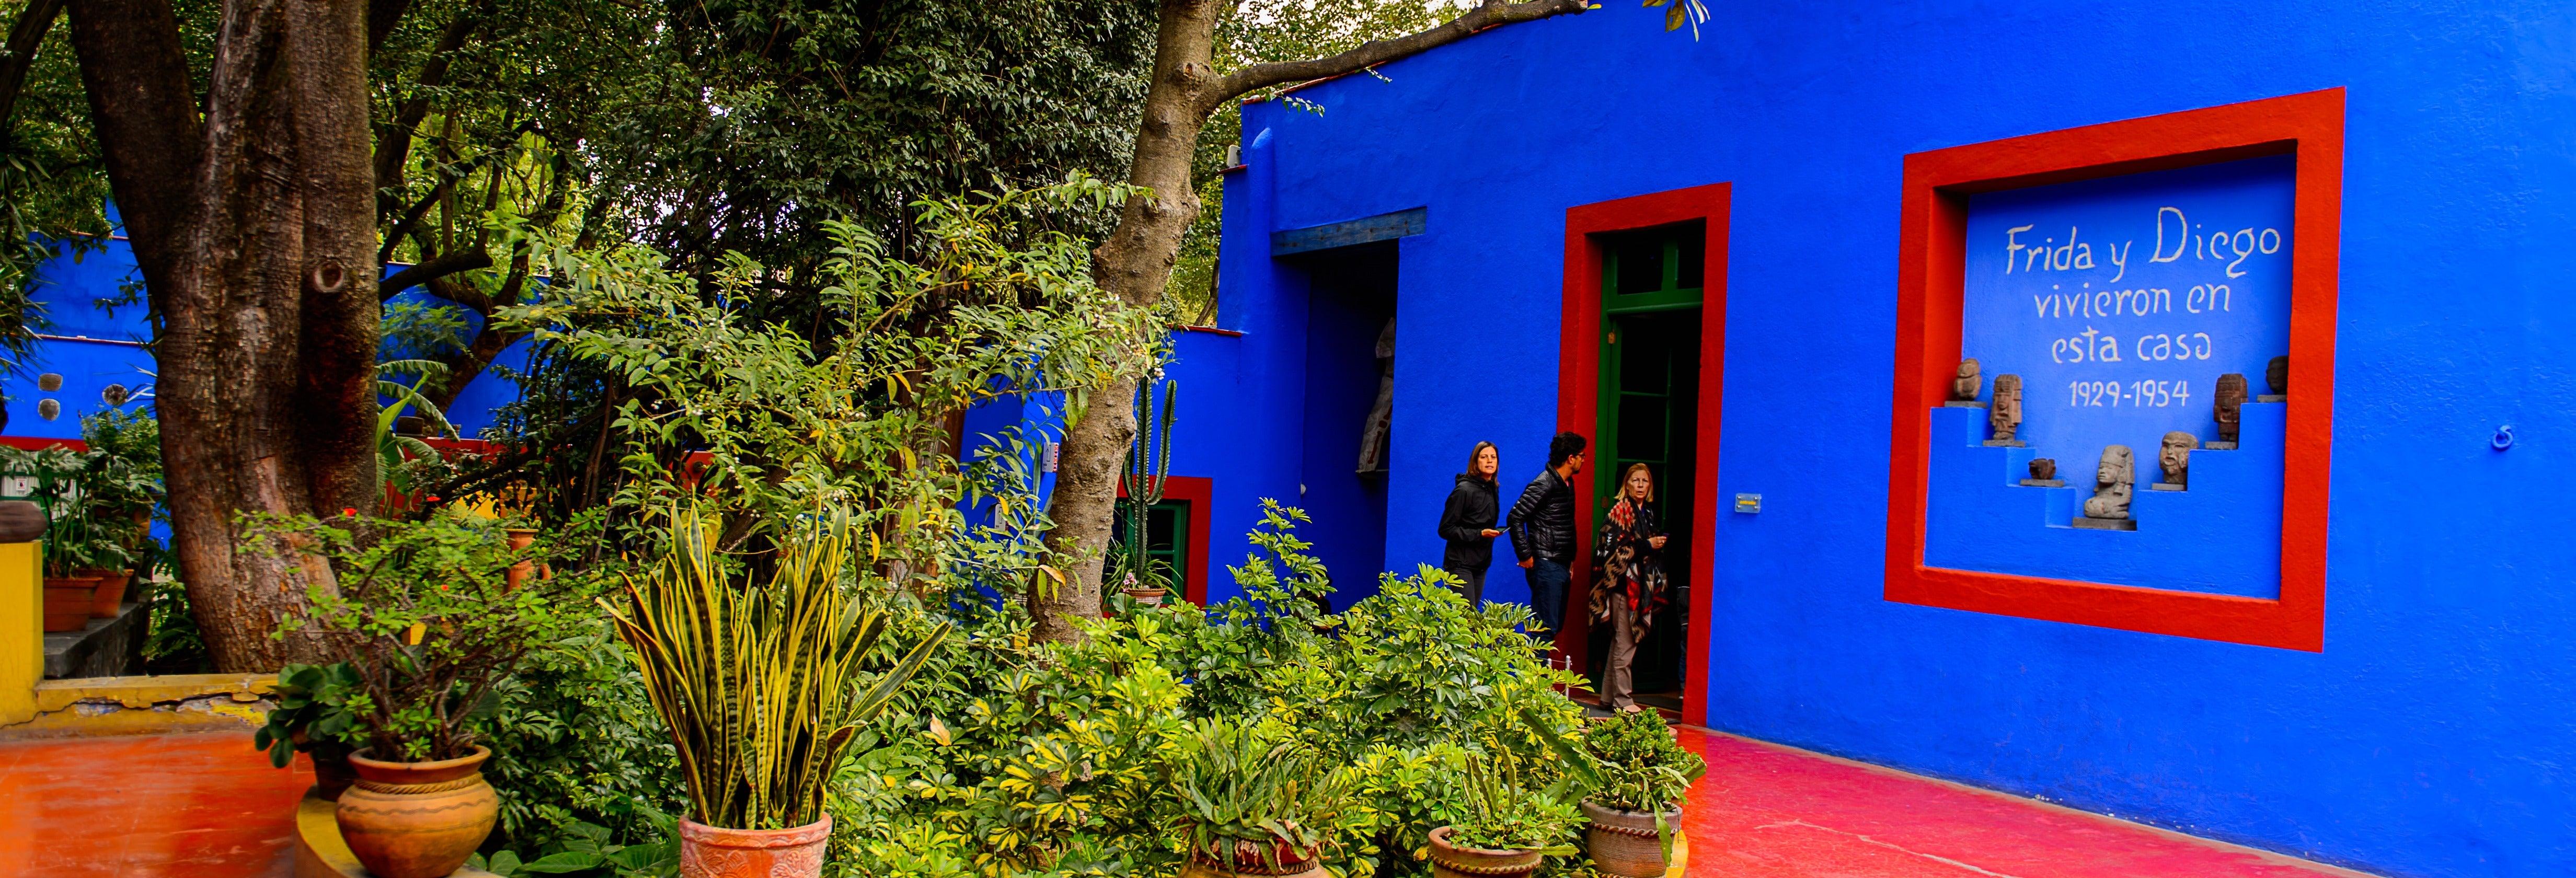 Frida Kahlo Free Tour of Coyoacán